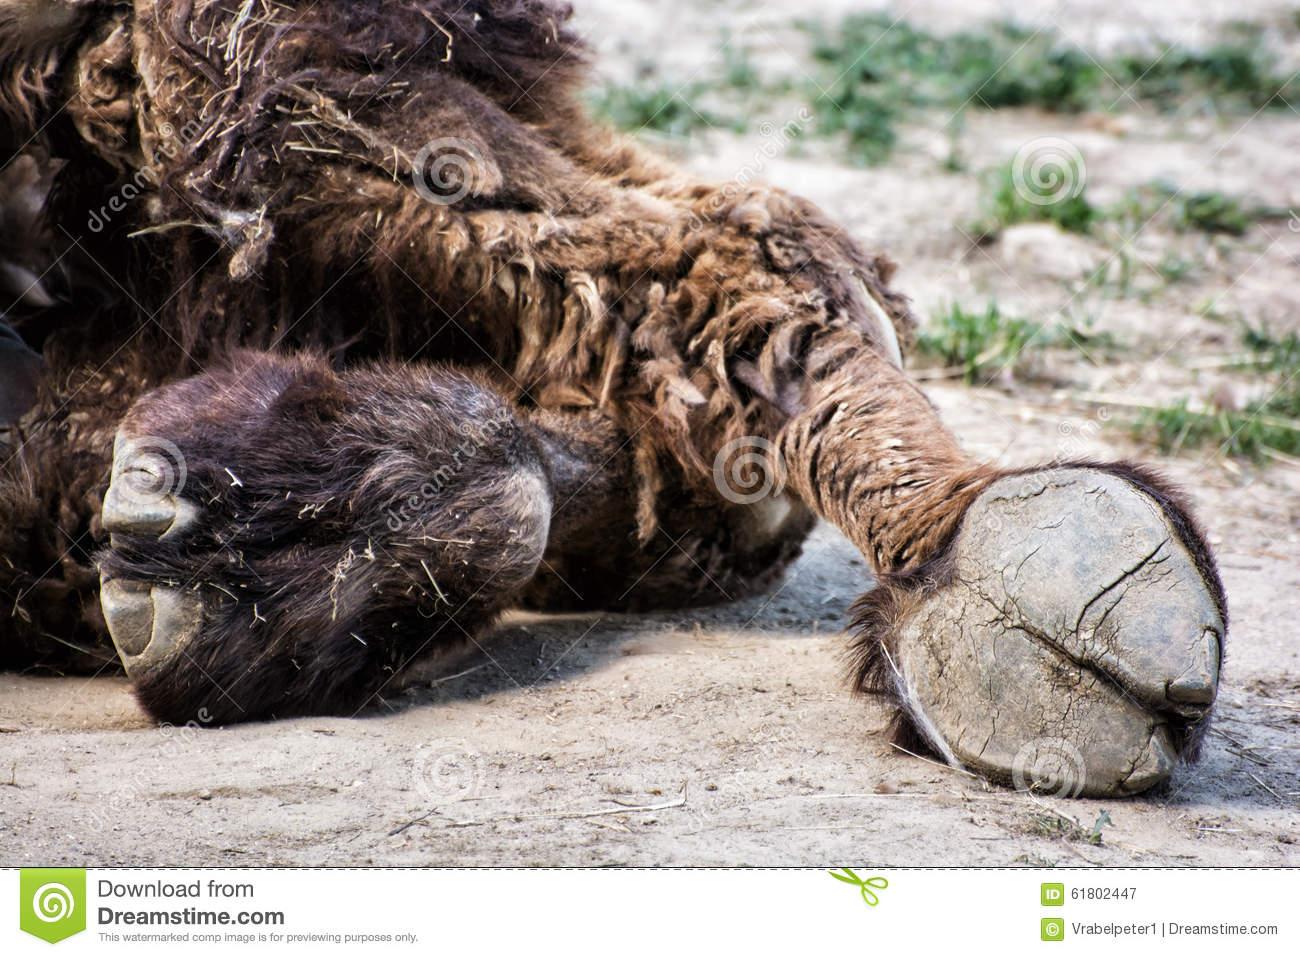 Bactrian Camel's Hoof Detail (Camelus Bactrianus), Animal Theme.